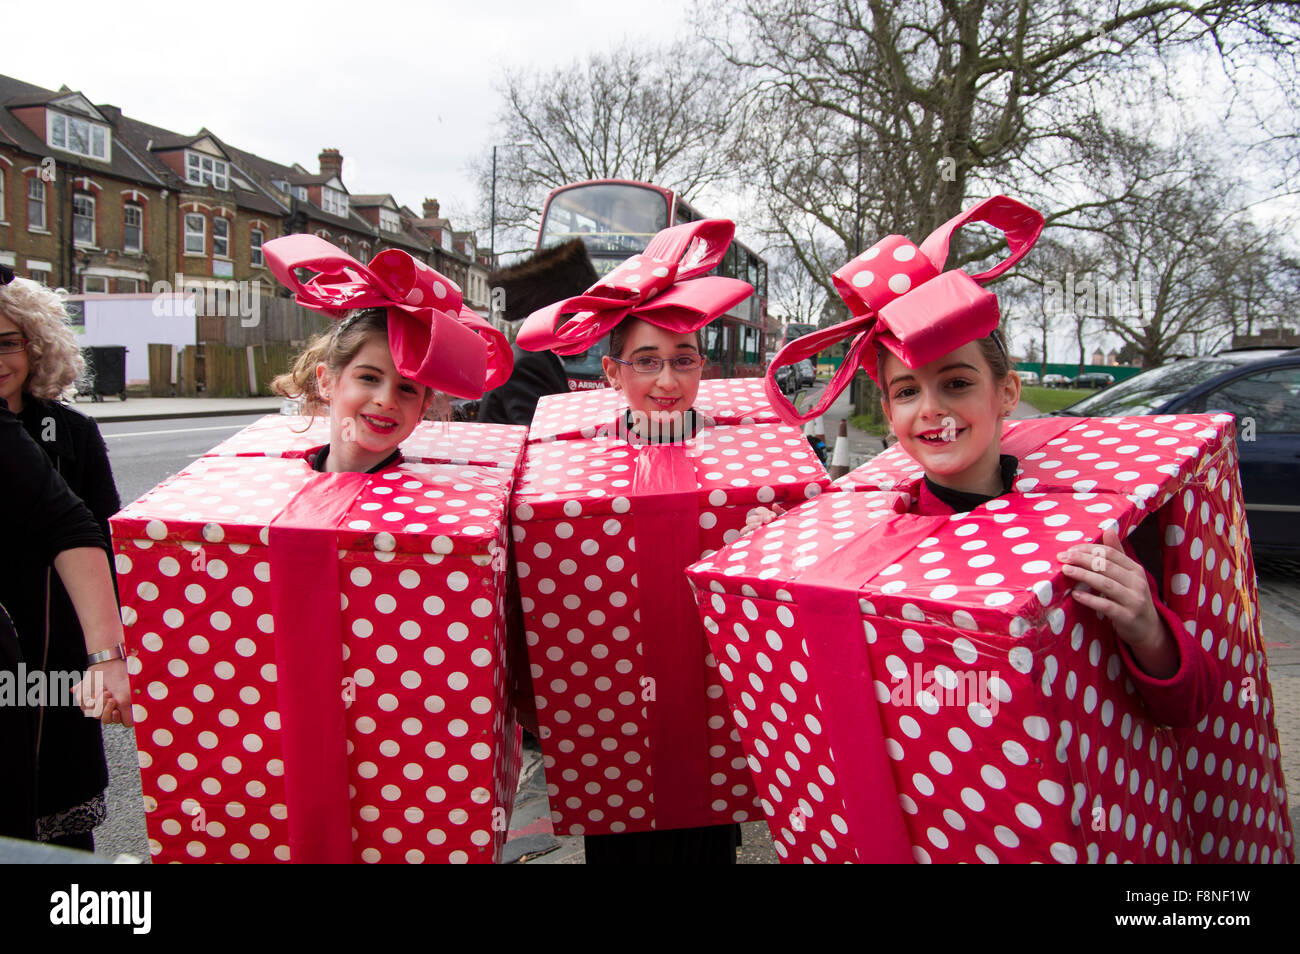 Three cheerful girls in homemade fancy dress costumes for the jewish three cheerful girls in homemade fancy dress costumes for the jewish holiday of purim in stamford hill london 5 march 2015 solutioingenieria Choice Image